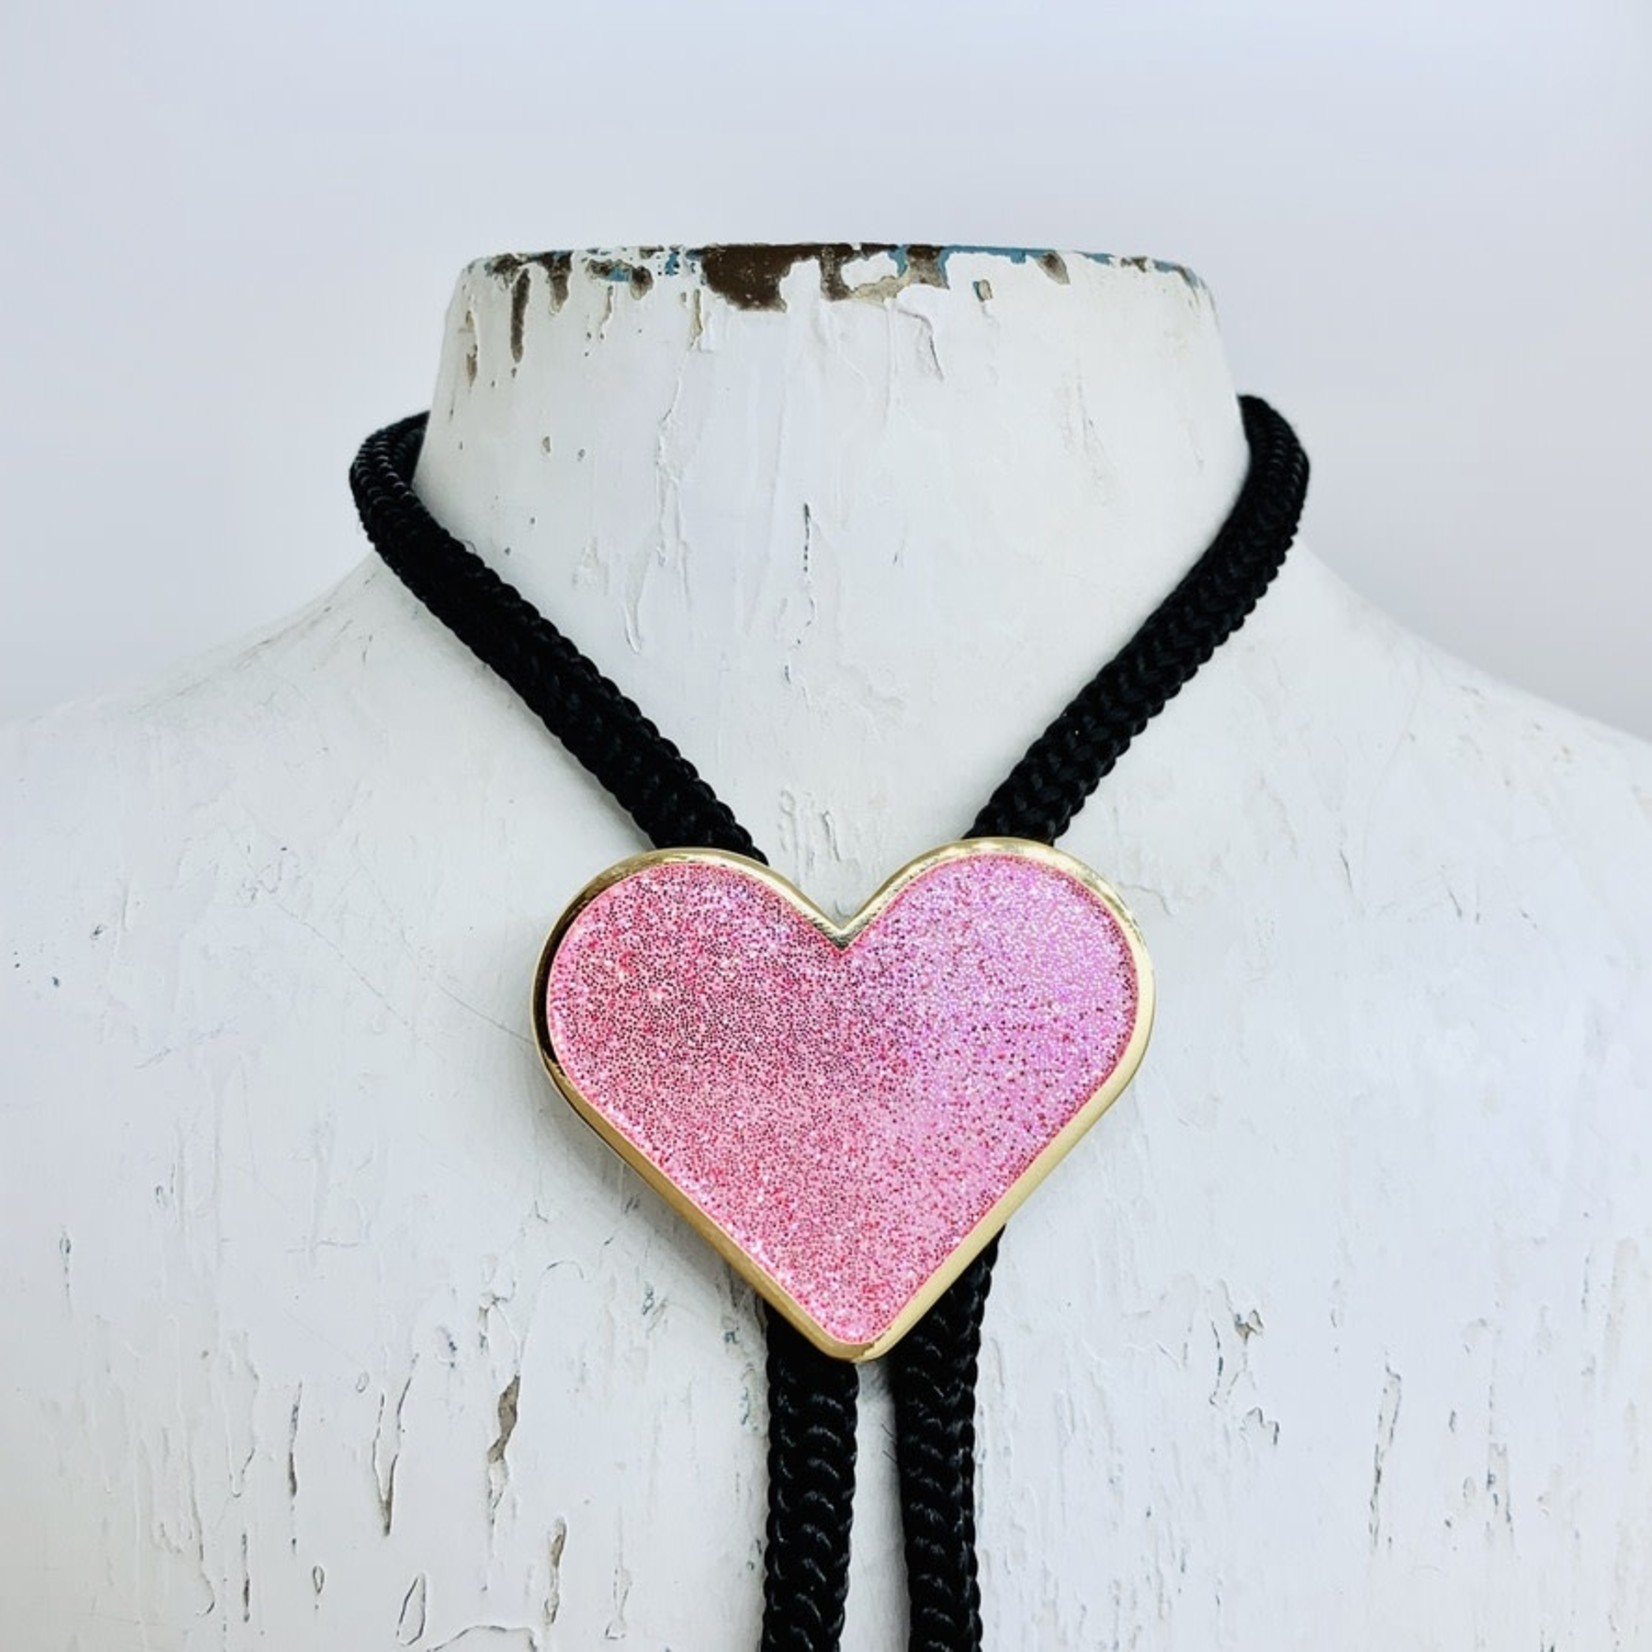 Tiny Deer Studio Glitter Heart Bolo Tie